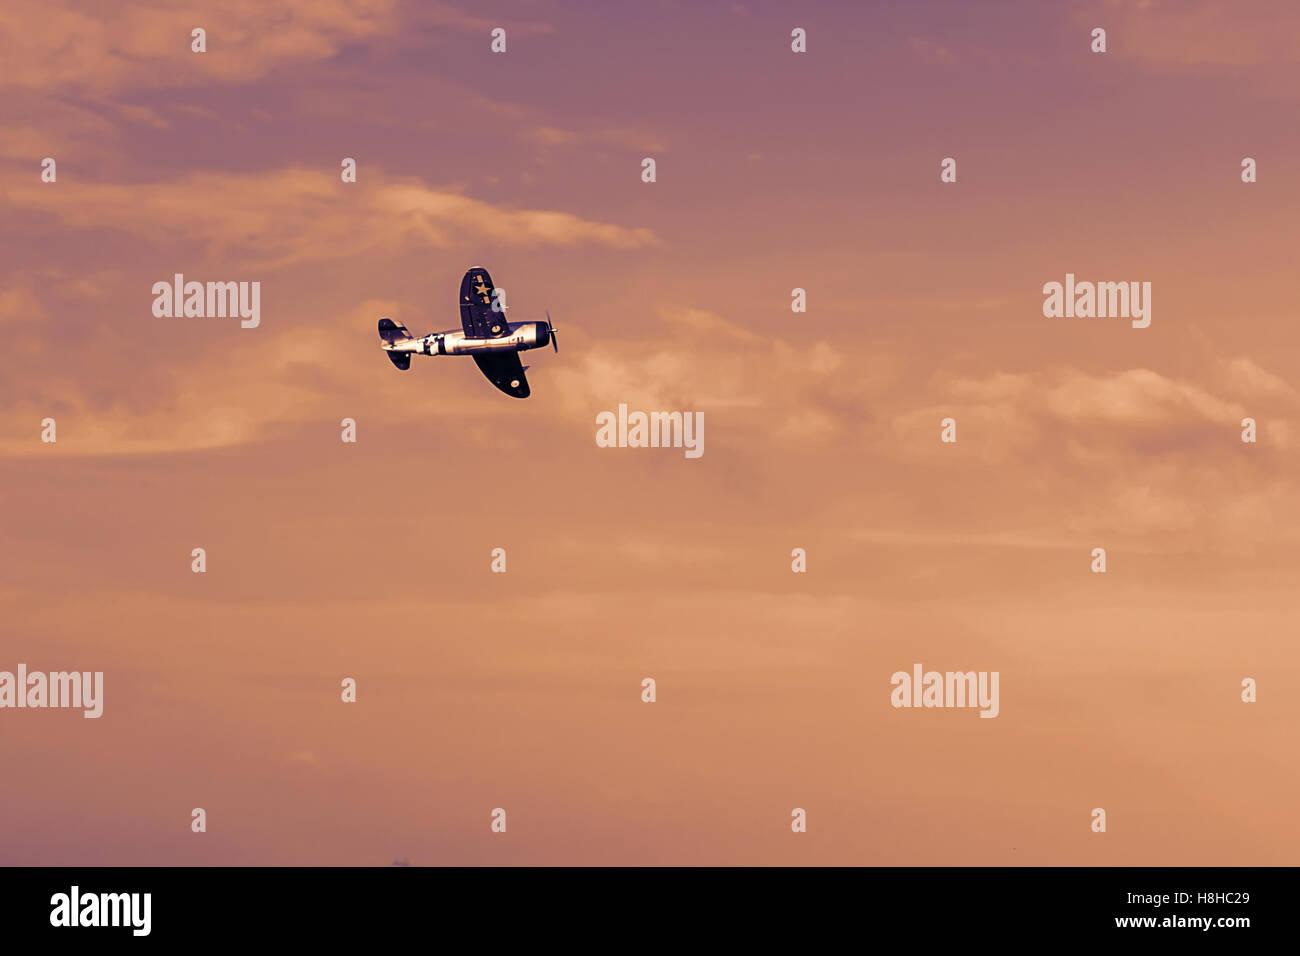 Ferngesteuerte Spielzeugflugzeug bei Sonnenuntergang. RC Modellbau Flugzeug fliegen im Sonnenuntergang. Flugzeug Stockbild